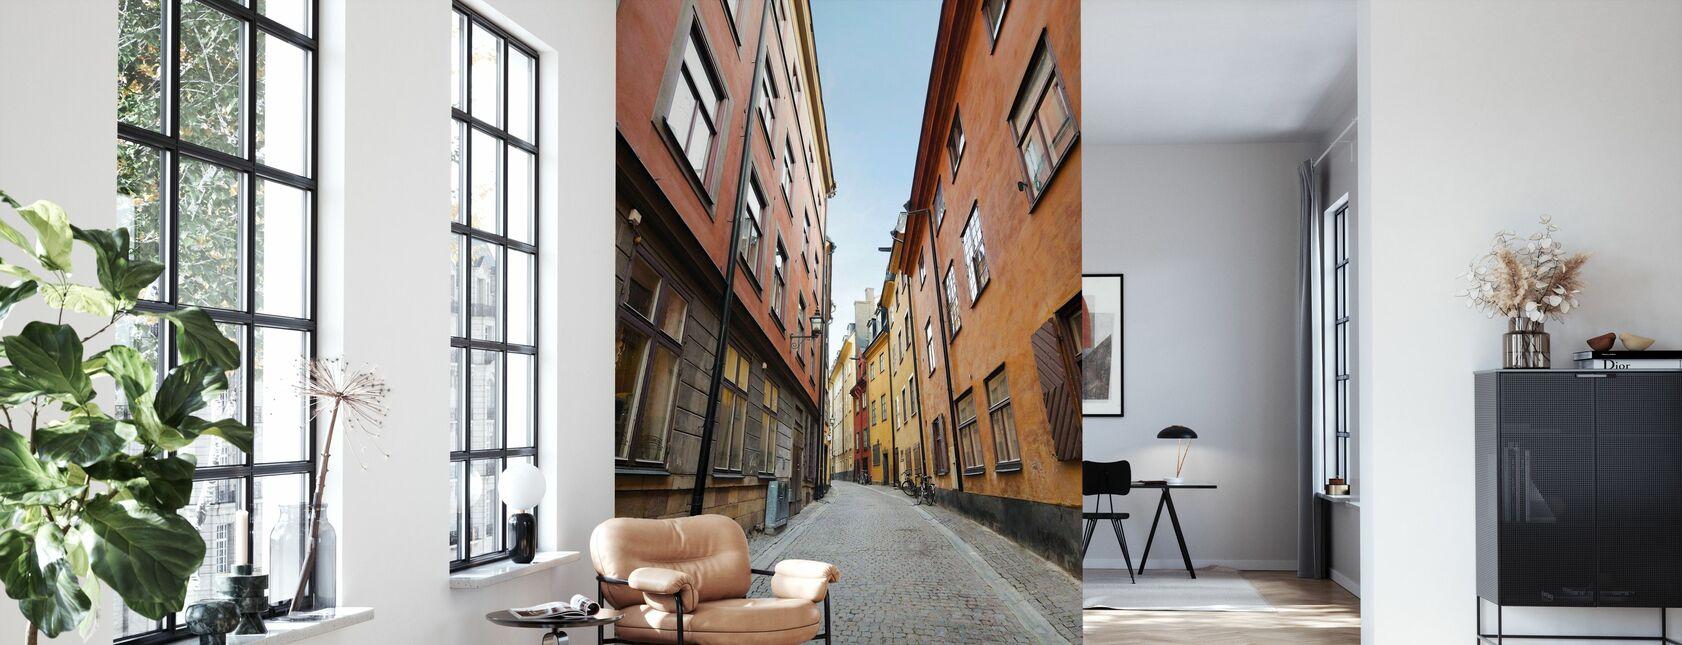 Old Town Street in Stockholm - Tapete - Wohnzimmer